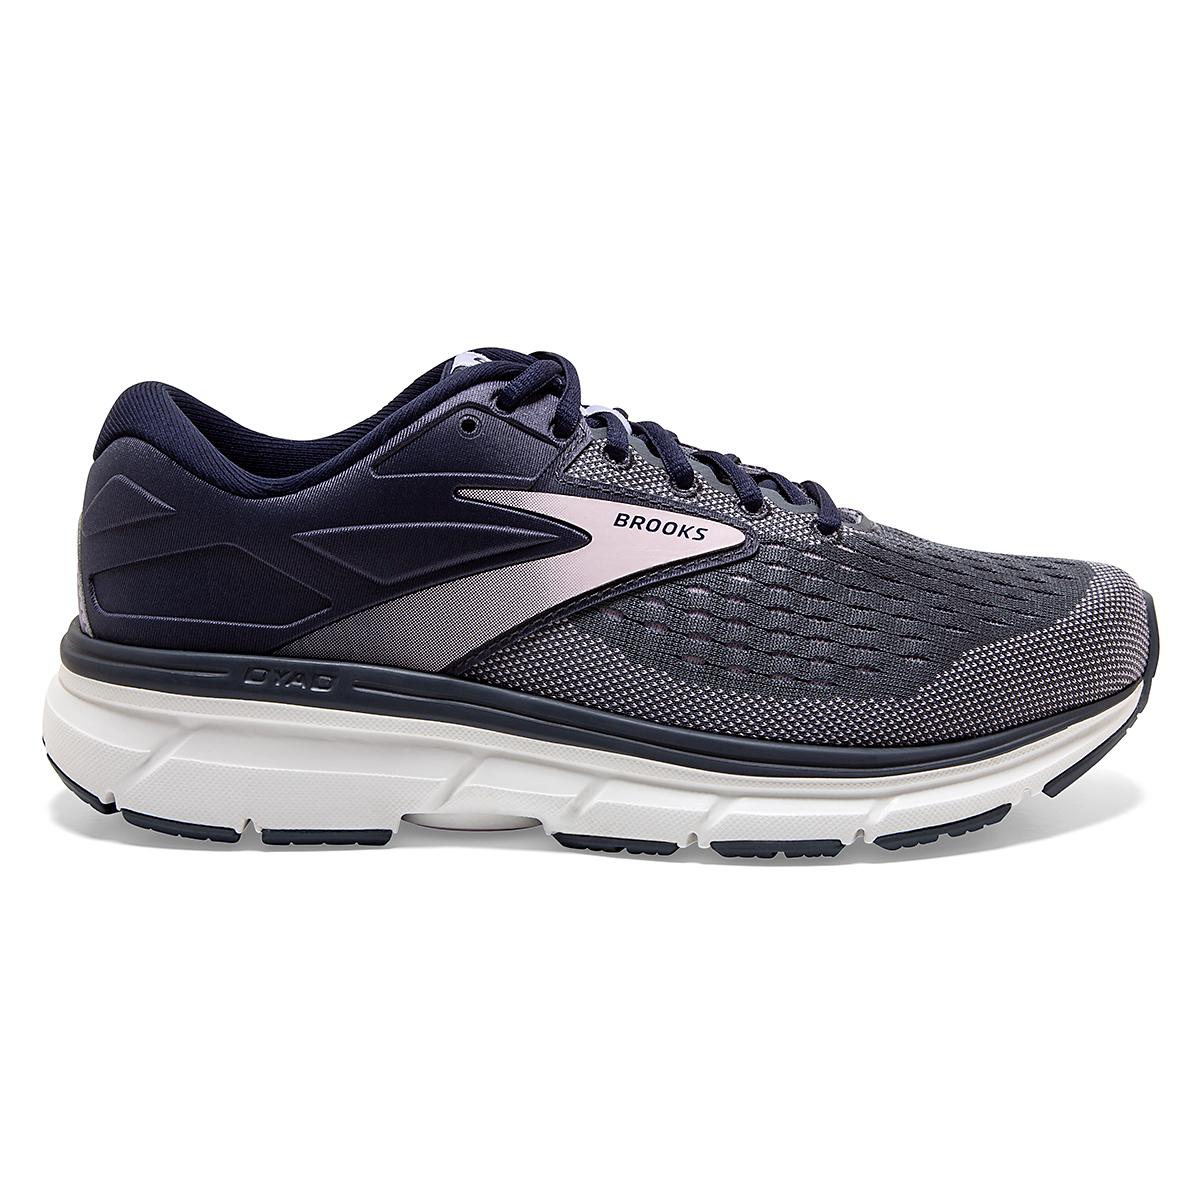 Women's Brooks Dyad 11 Running Shoe - Color: Ombre/Primrose  - Size: 6 - Width: Regular, Ombre/Primrose, large, image 1